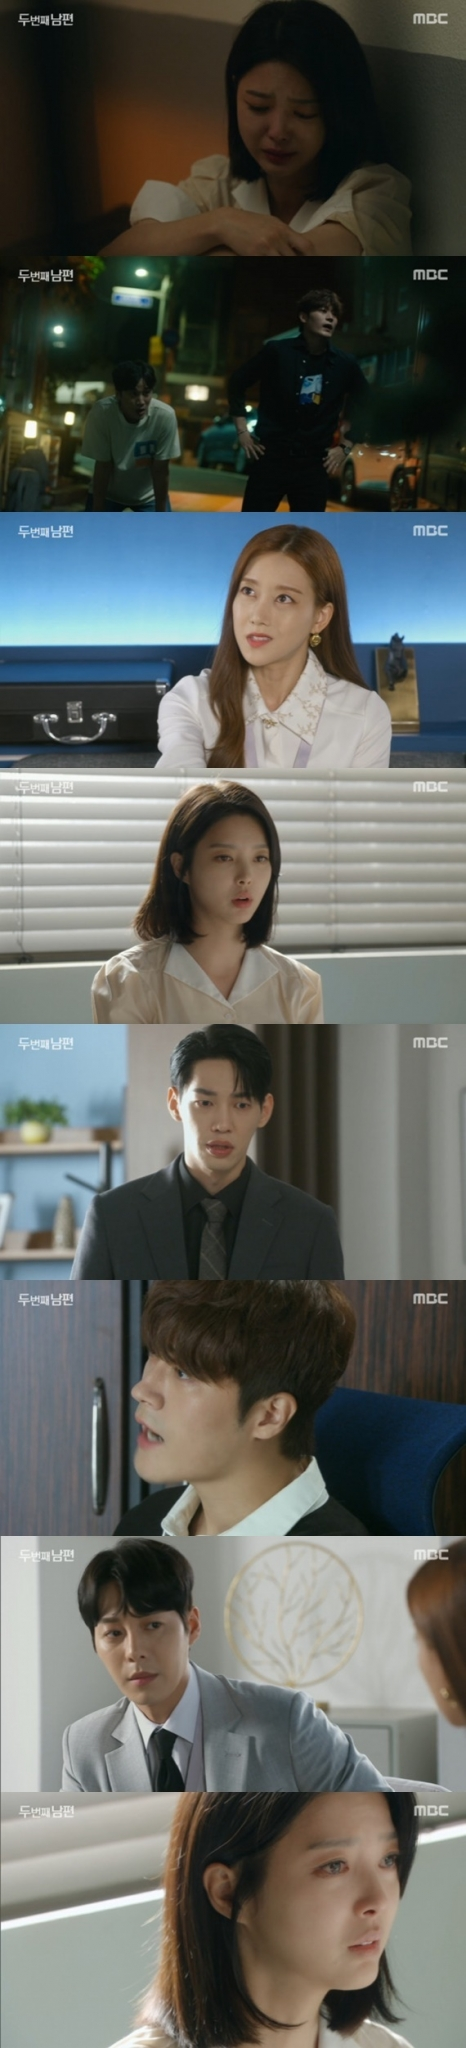 MBC '두 번째 남편' © 뉴스1